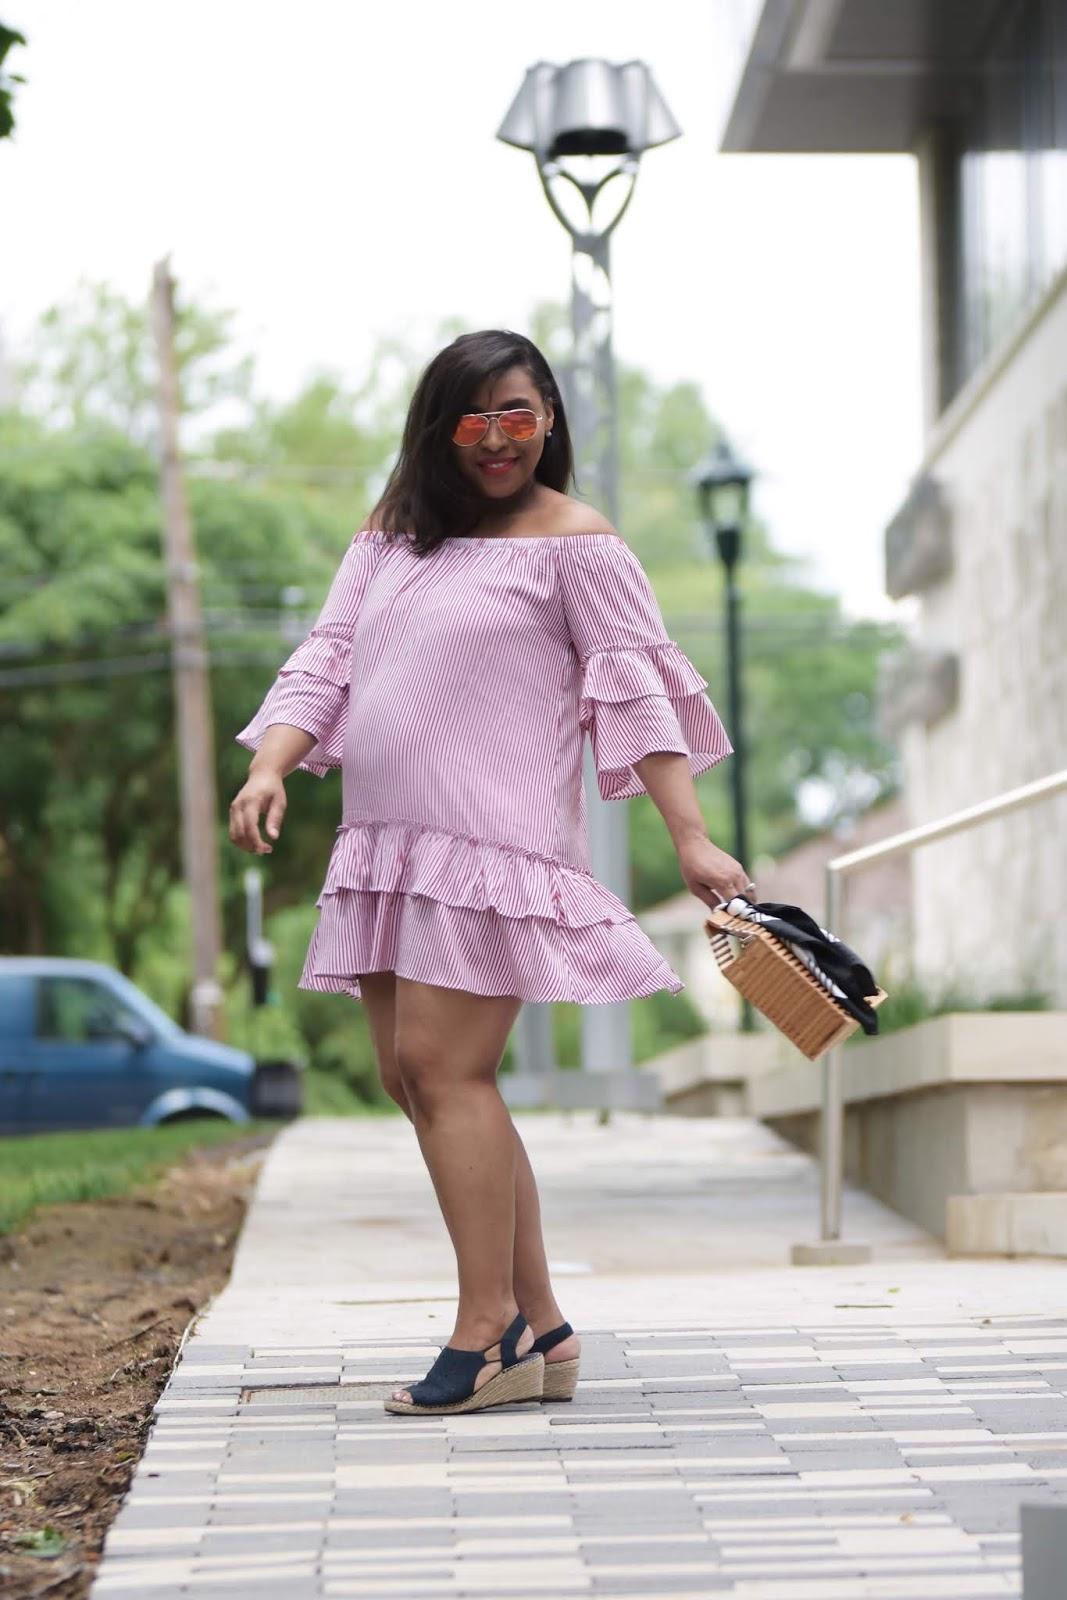 Summer Dresses For Every Budget, mom blogger, summer trends, summer dresses, summer looks, pregnant in heels, ruffle dress